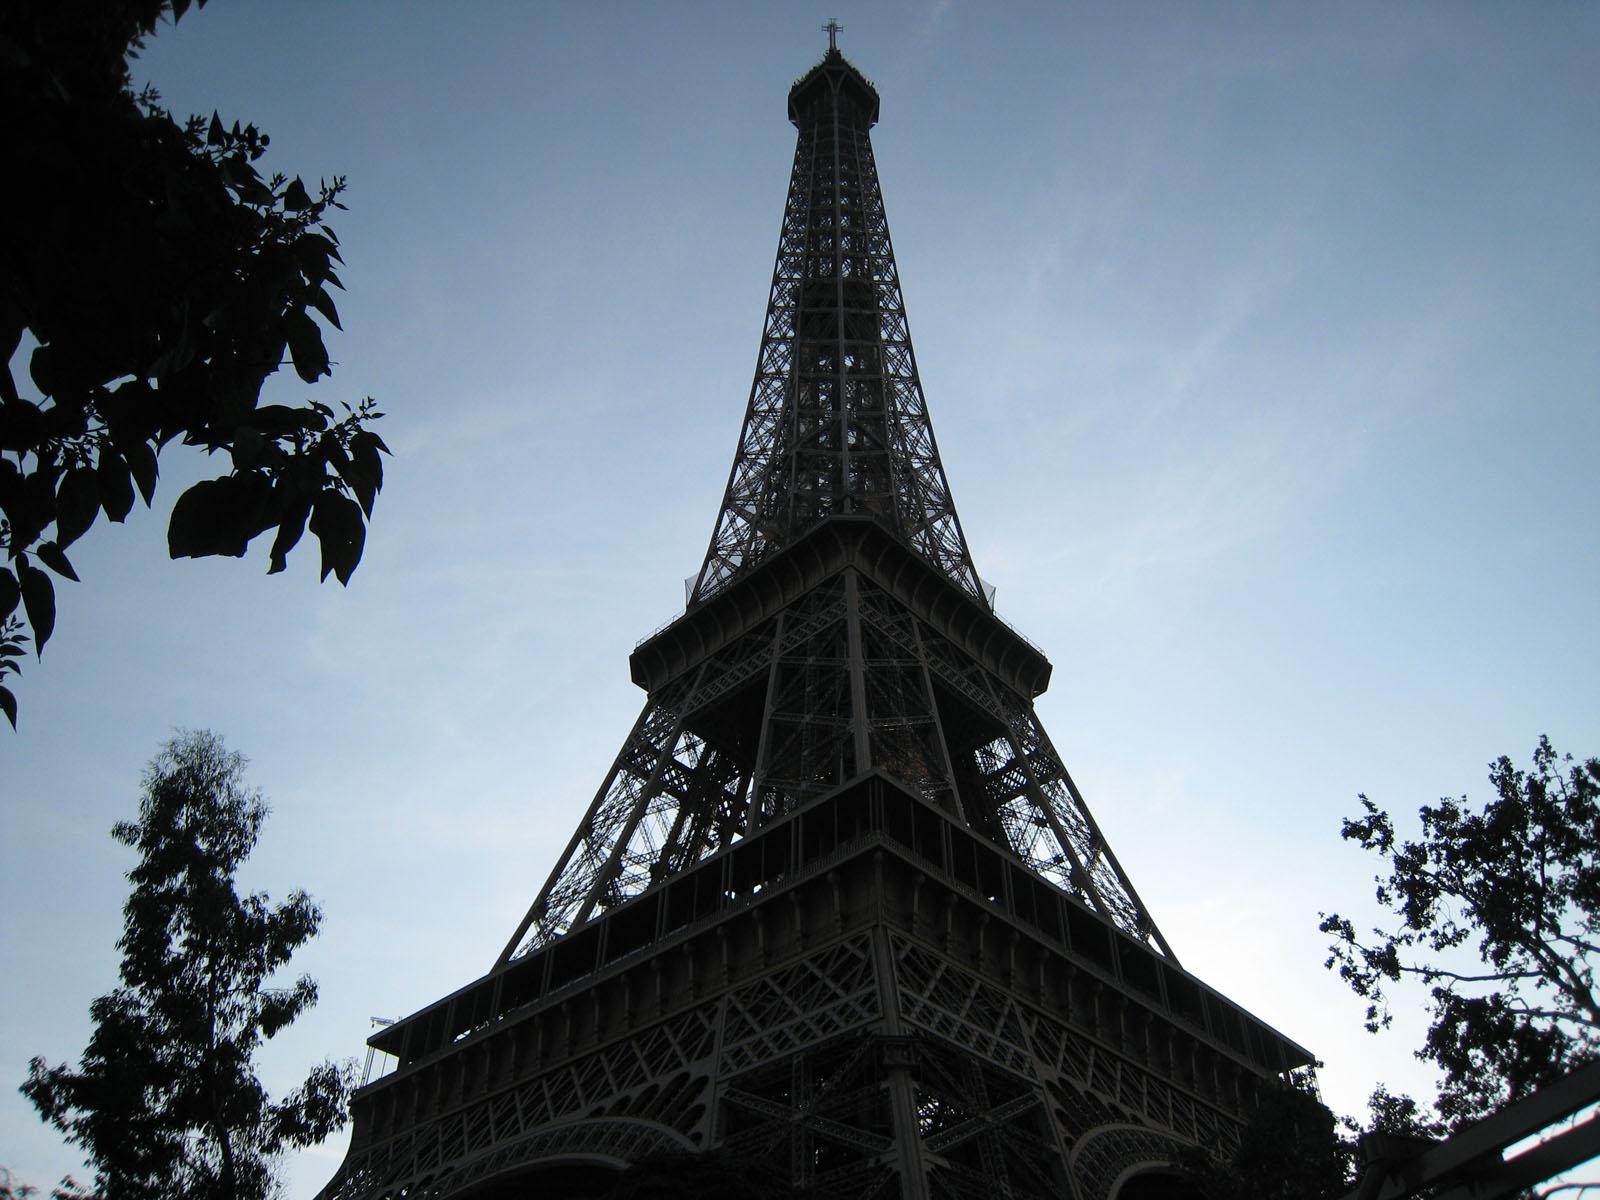 http://4.bp.blogspot.com/-xFTwWZy3Jys/Tr-CDwU1kUI/AAAAAAAAQGg/idFLU2bGDbI/s1600/095+Paris+-+Tour+Eiffel.jpg